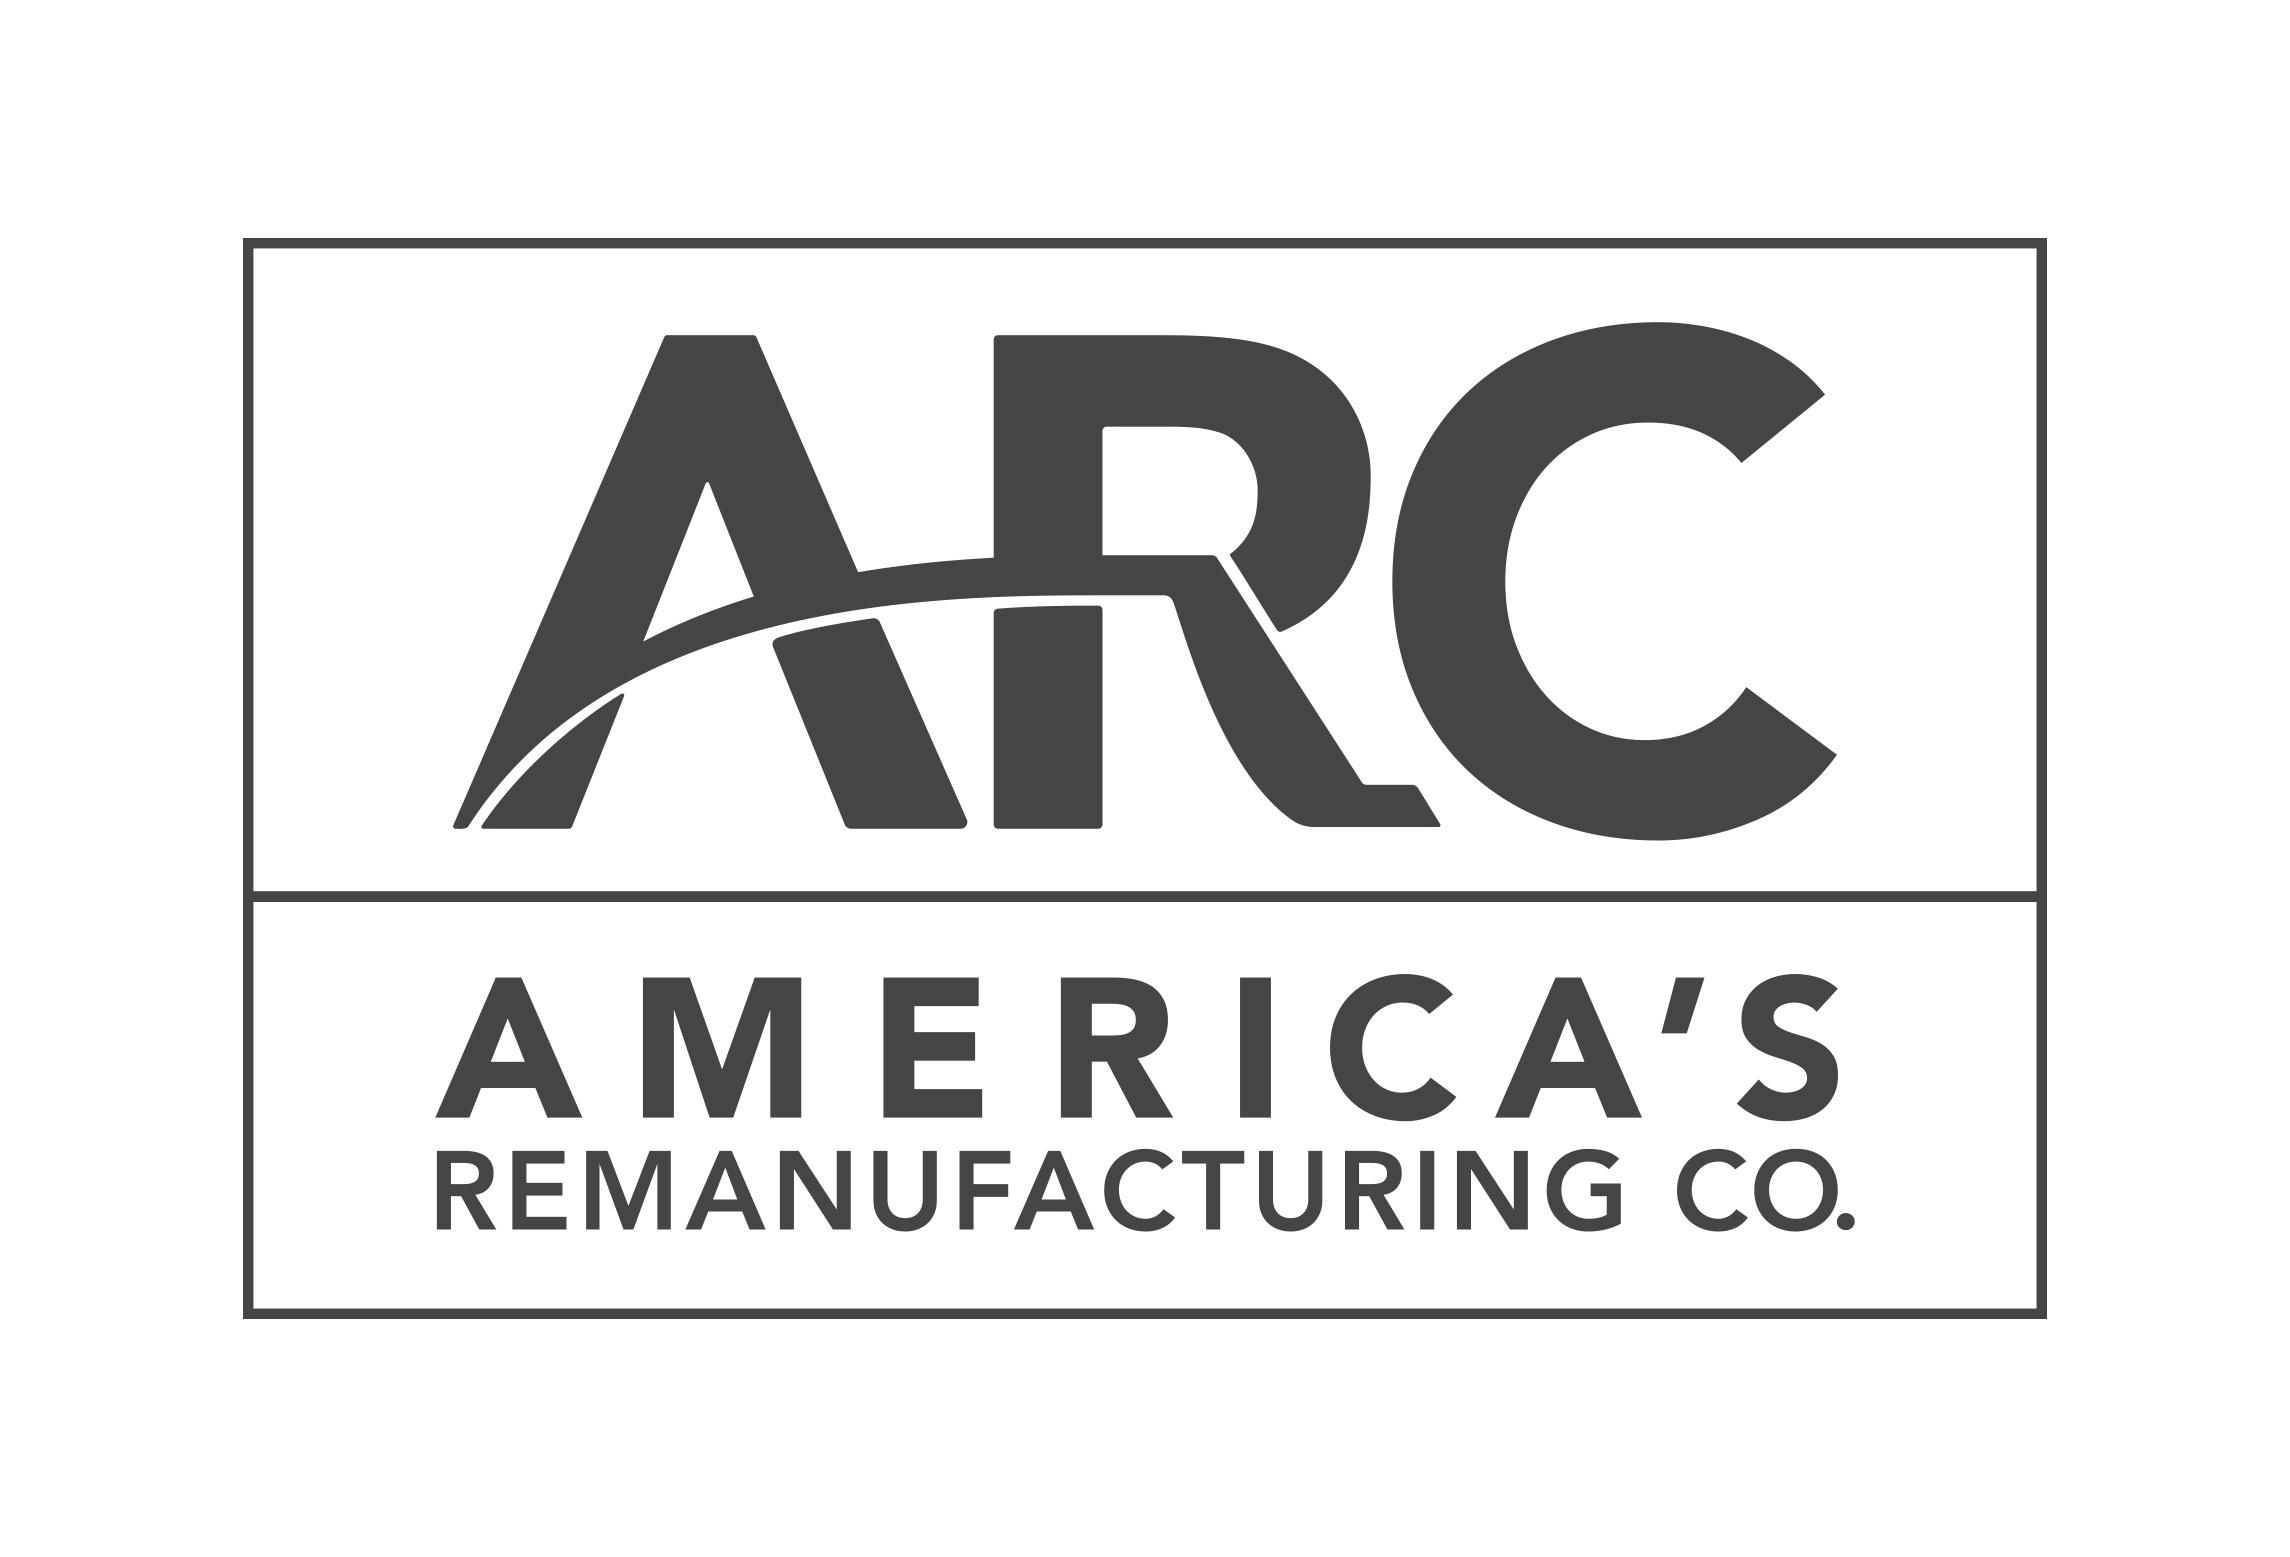 America's Remanufacturing Company